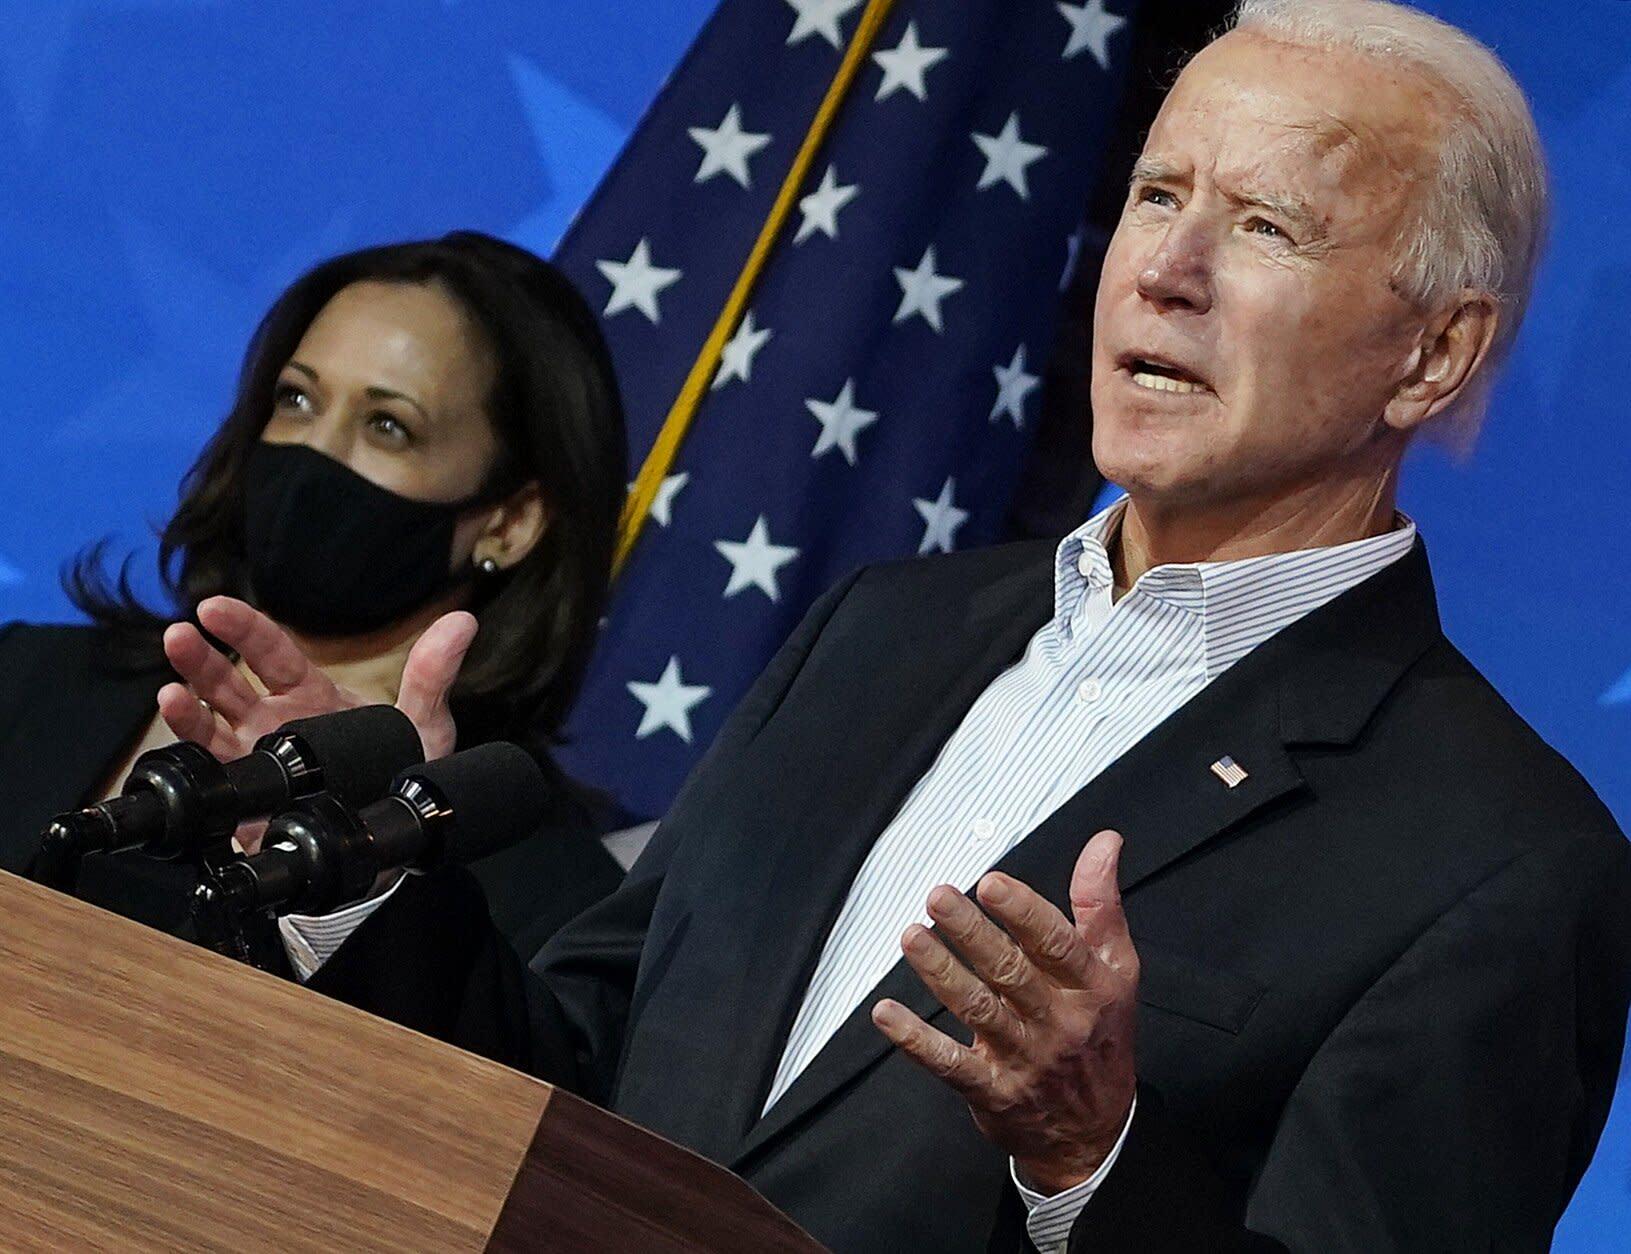 The Best Celebrity Reactions To Joe Biden And Kamala Harris Winning The 2020 Election